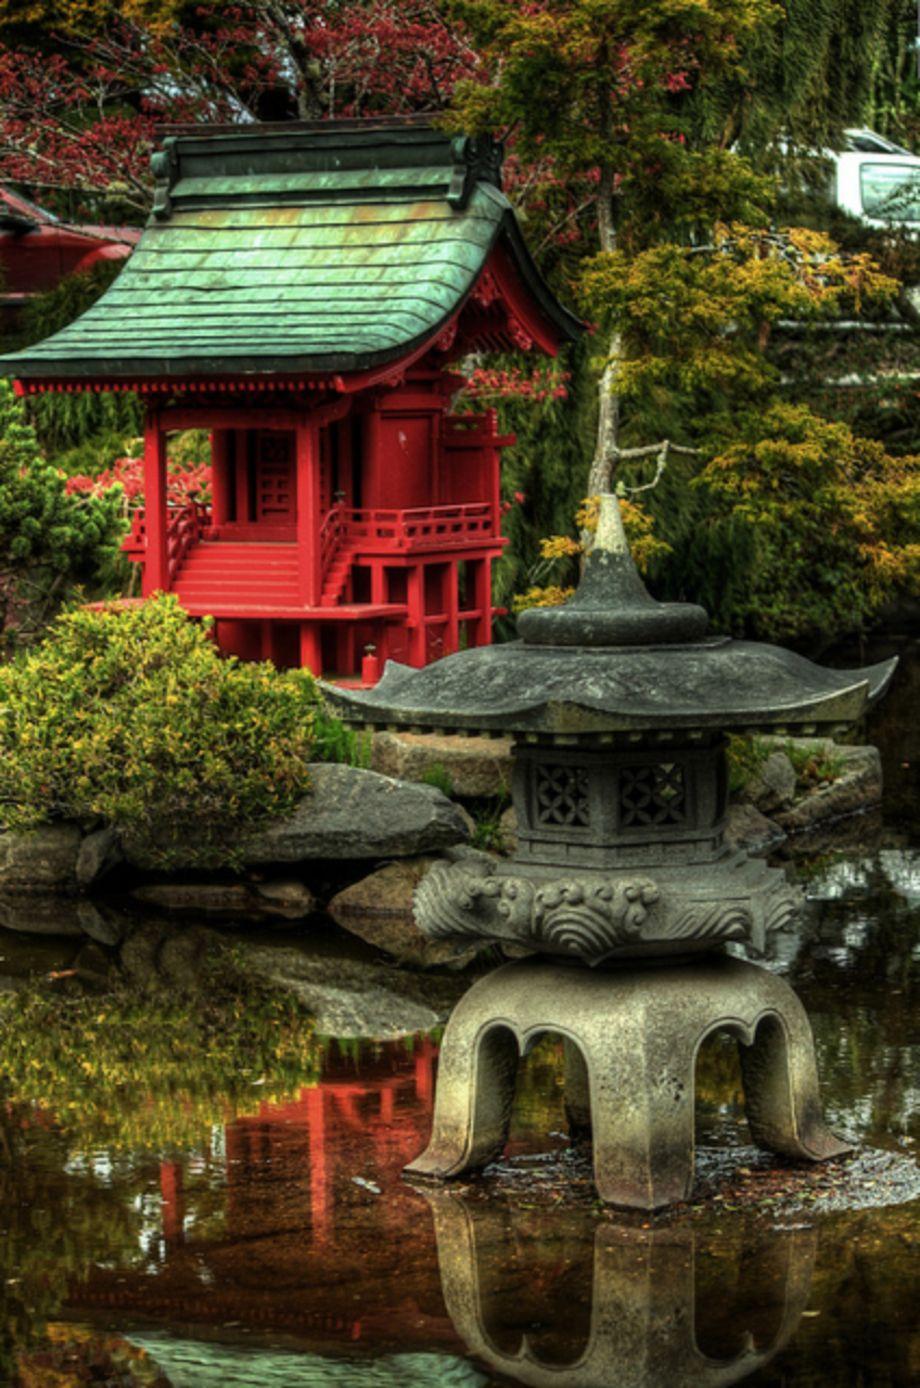 28 Japanese Garden Design Ideas To Style Up Your Backyard: Stunning Japanese Garden Ideas Plants You Will Love 42